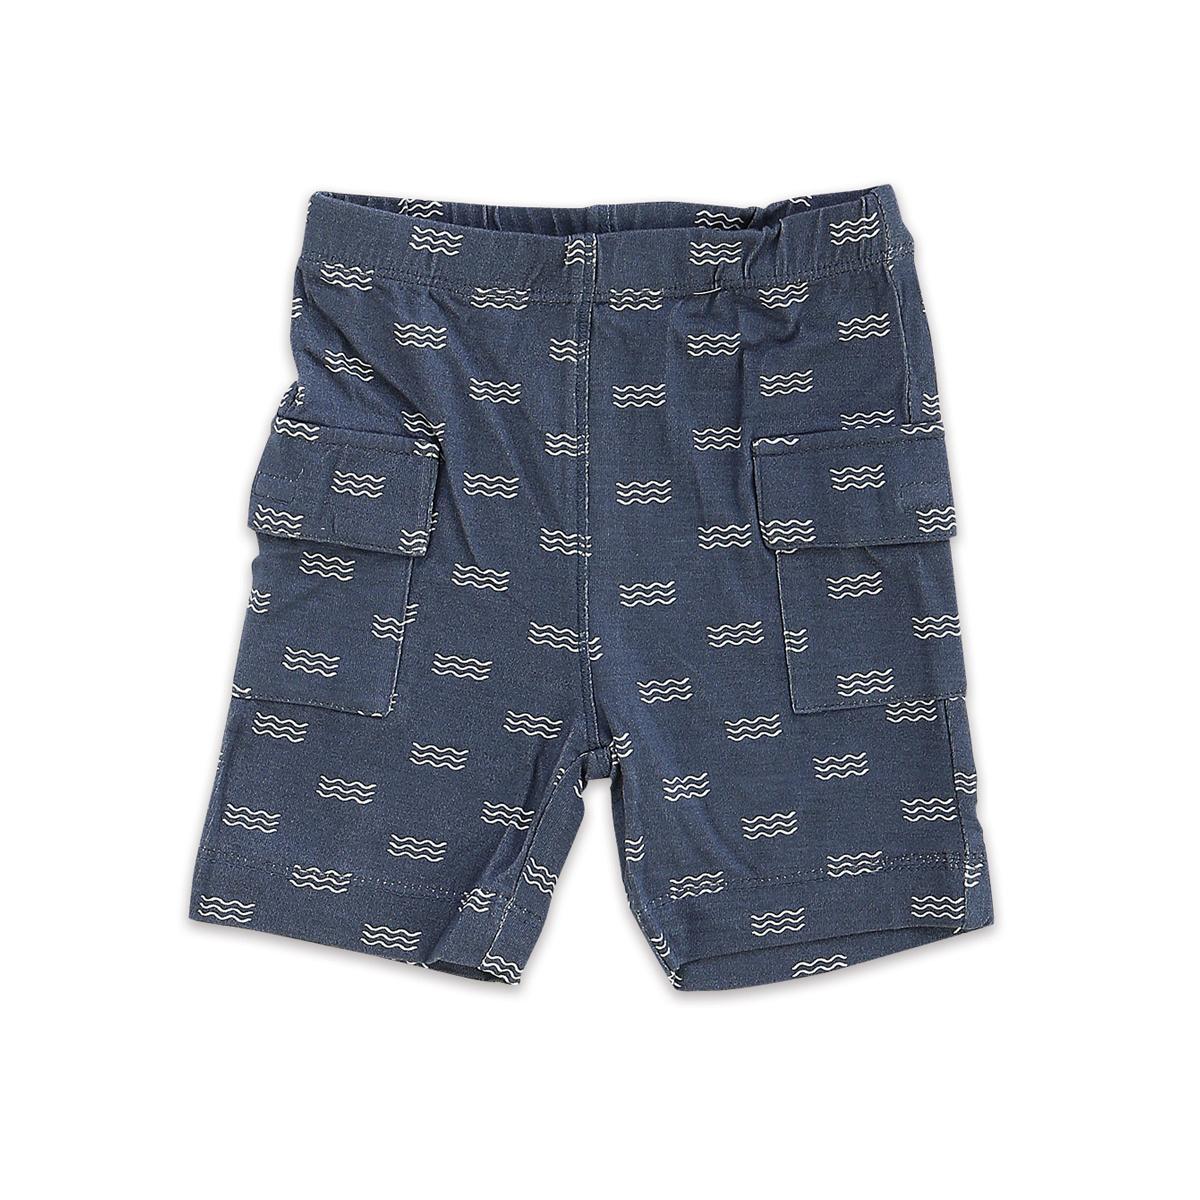 Silkberry Baby Bamboo Cargo Pocket Shorts Wave